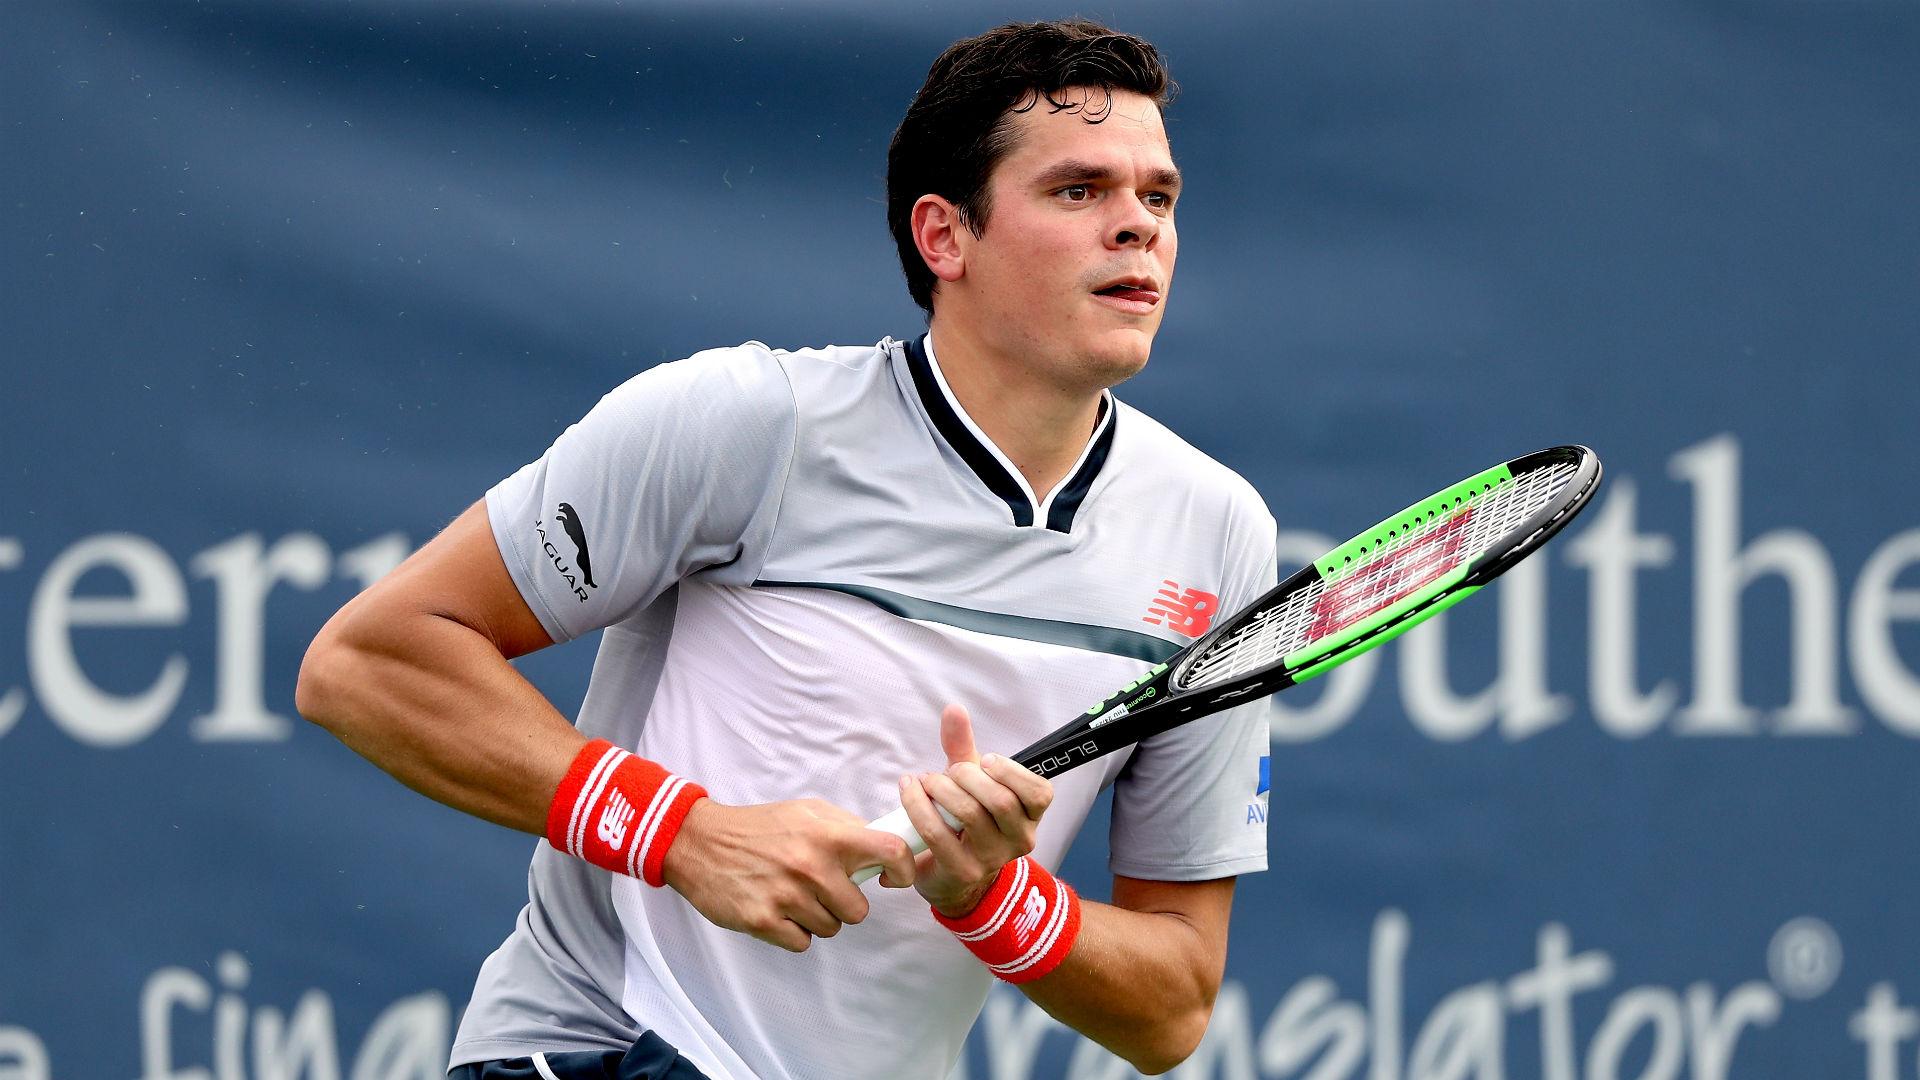 Roger Federer to face Novak Djokovic in Cincinnati Masters final